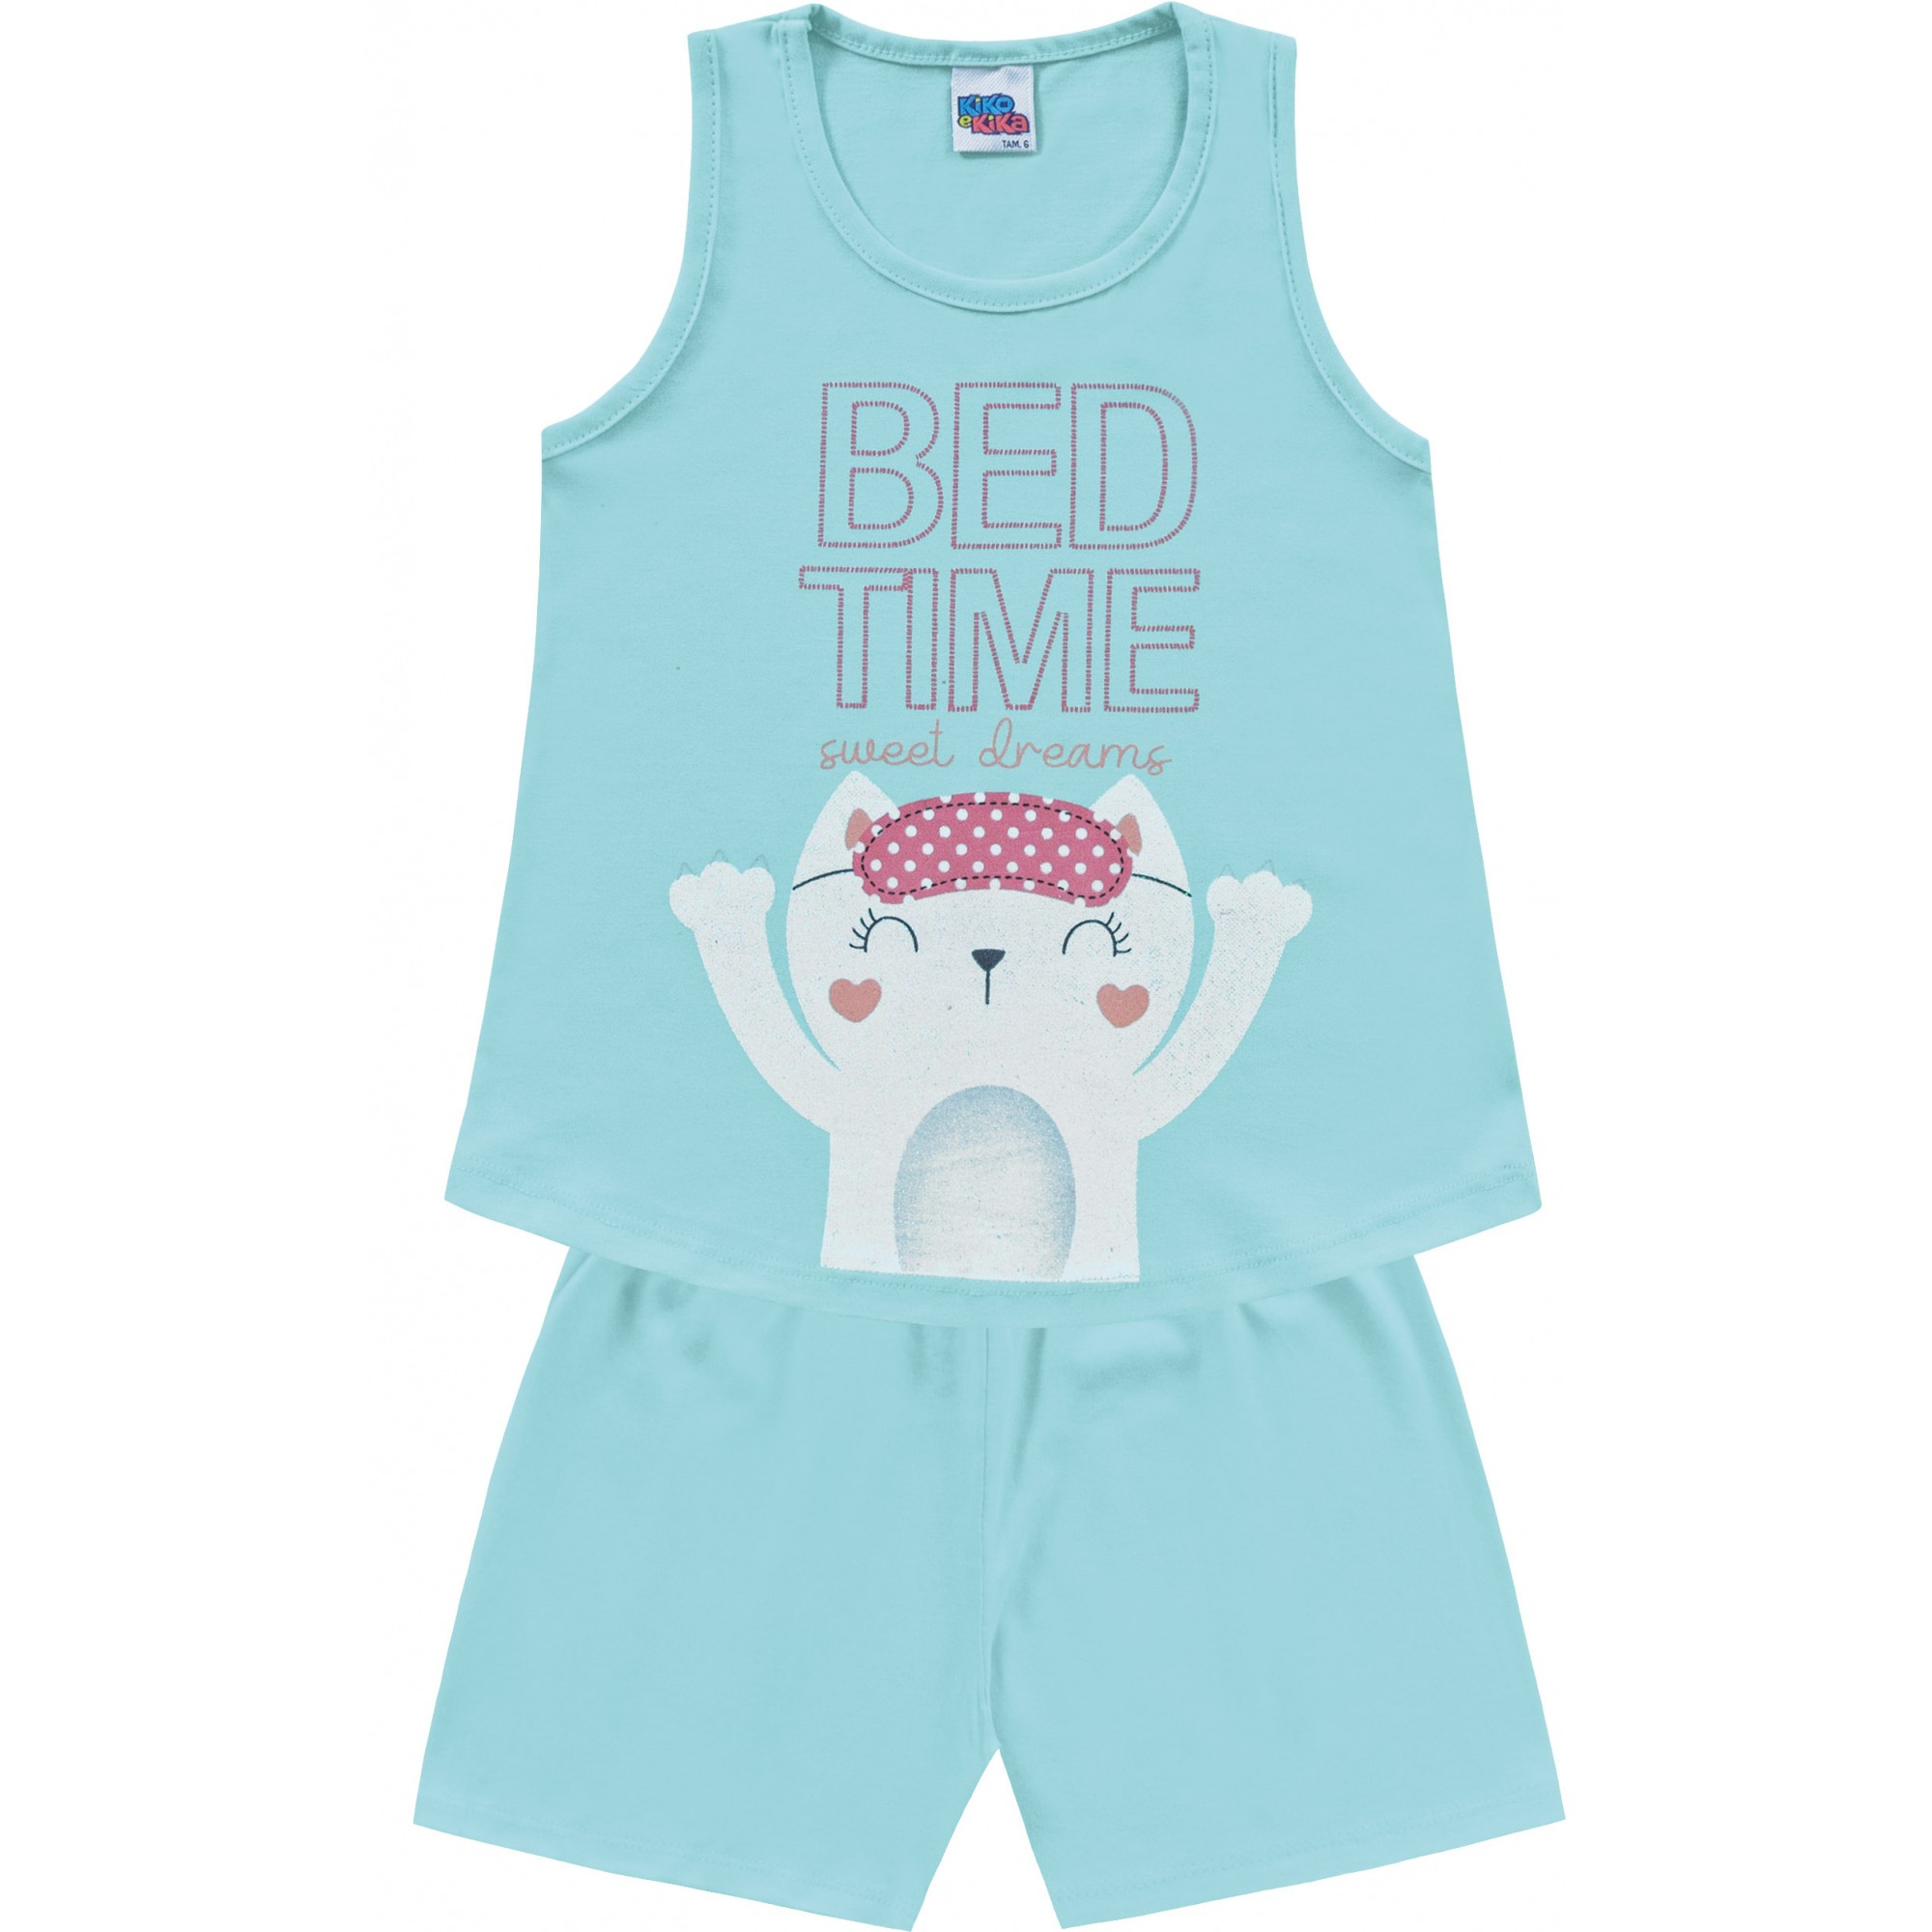 Pijama Regata Bed Time Água Kiko e Kika